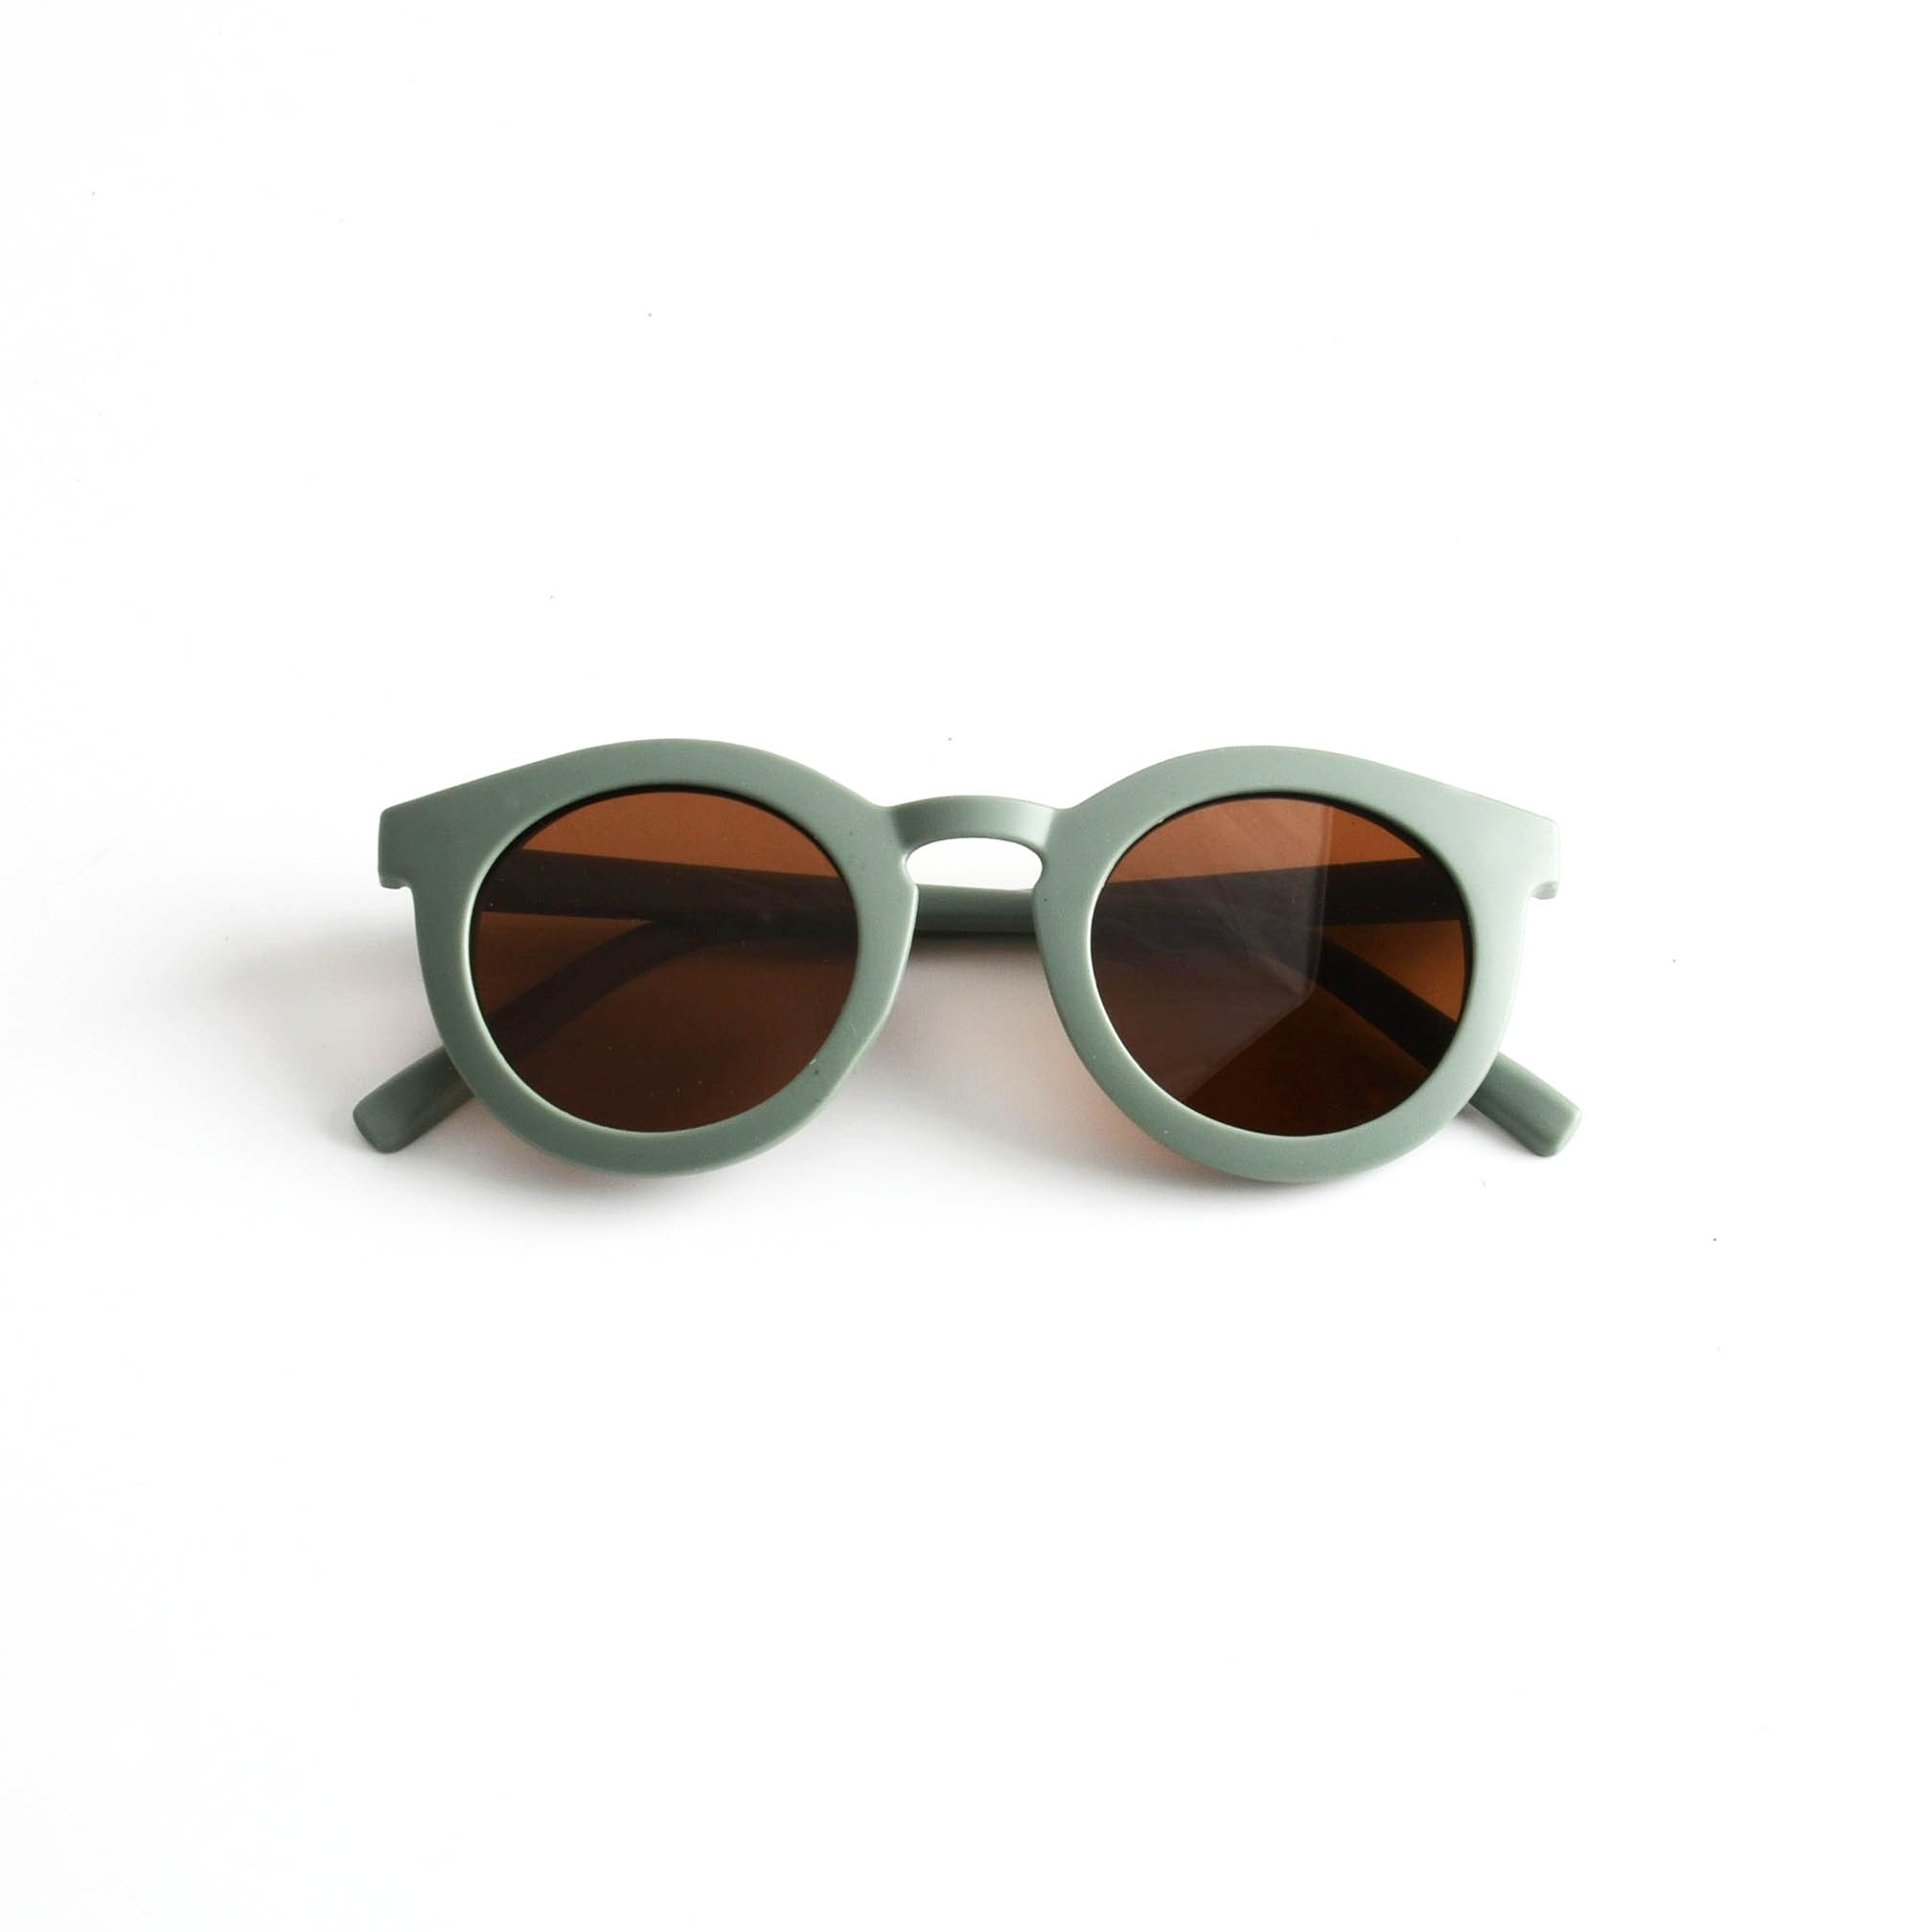 Sunglasses Fern  12.5cm x 14cm